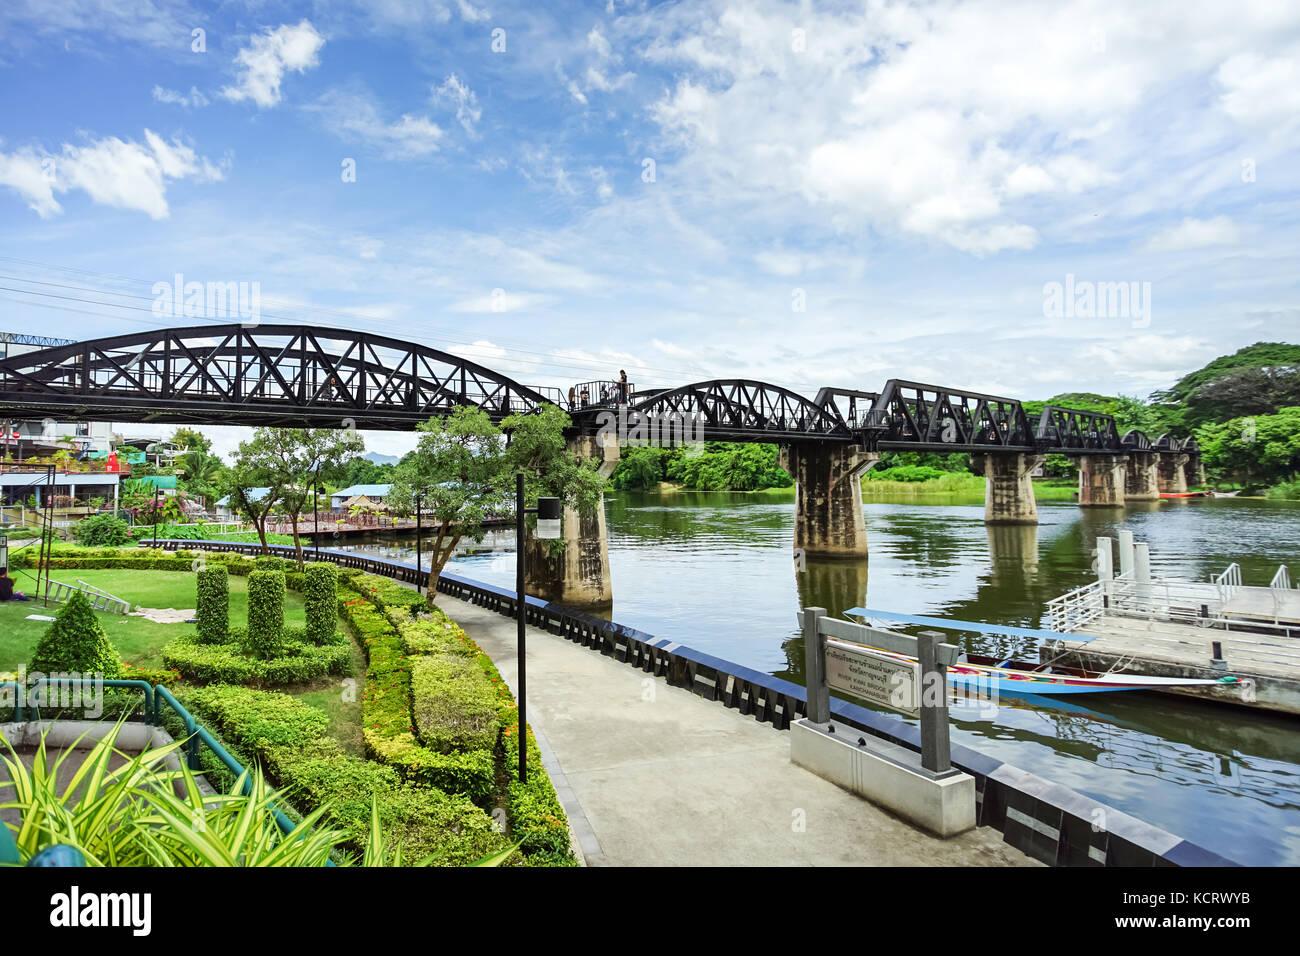 The Bridge of the River Kwai in Kanchanaburi, Thailand - Stock Image